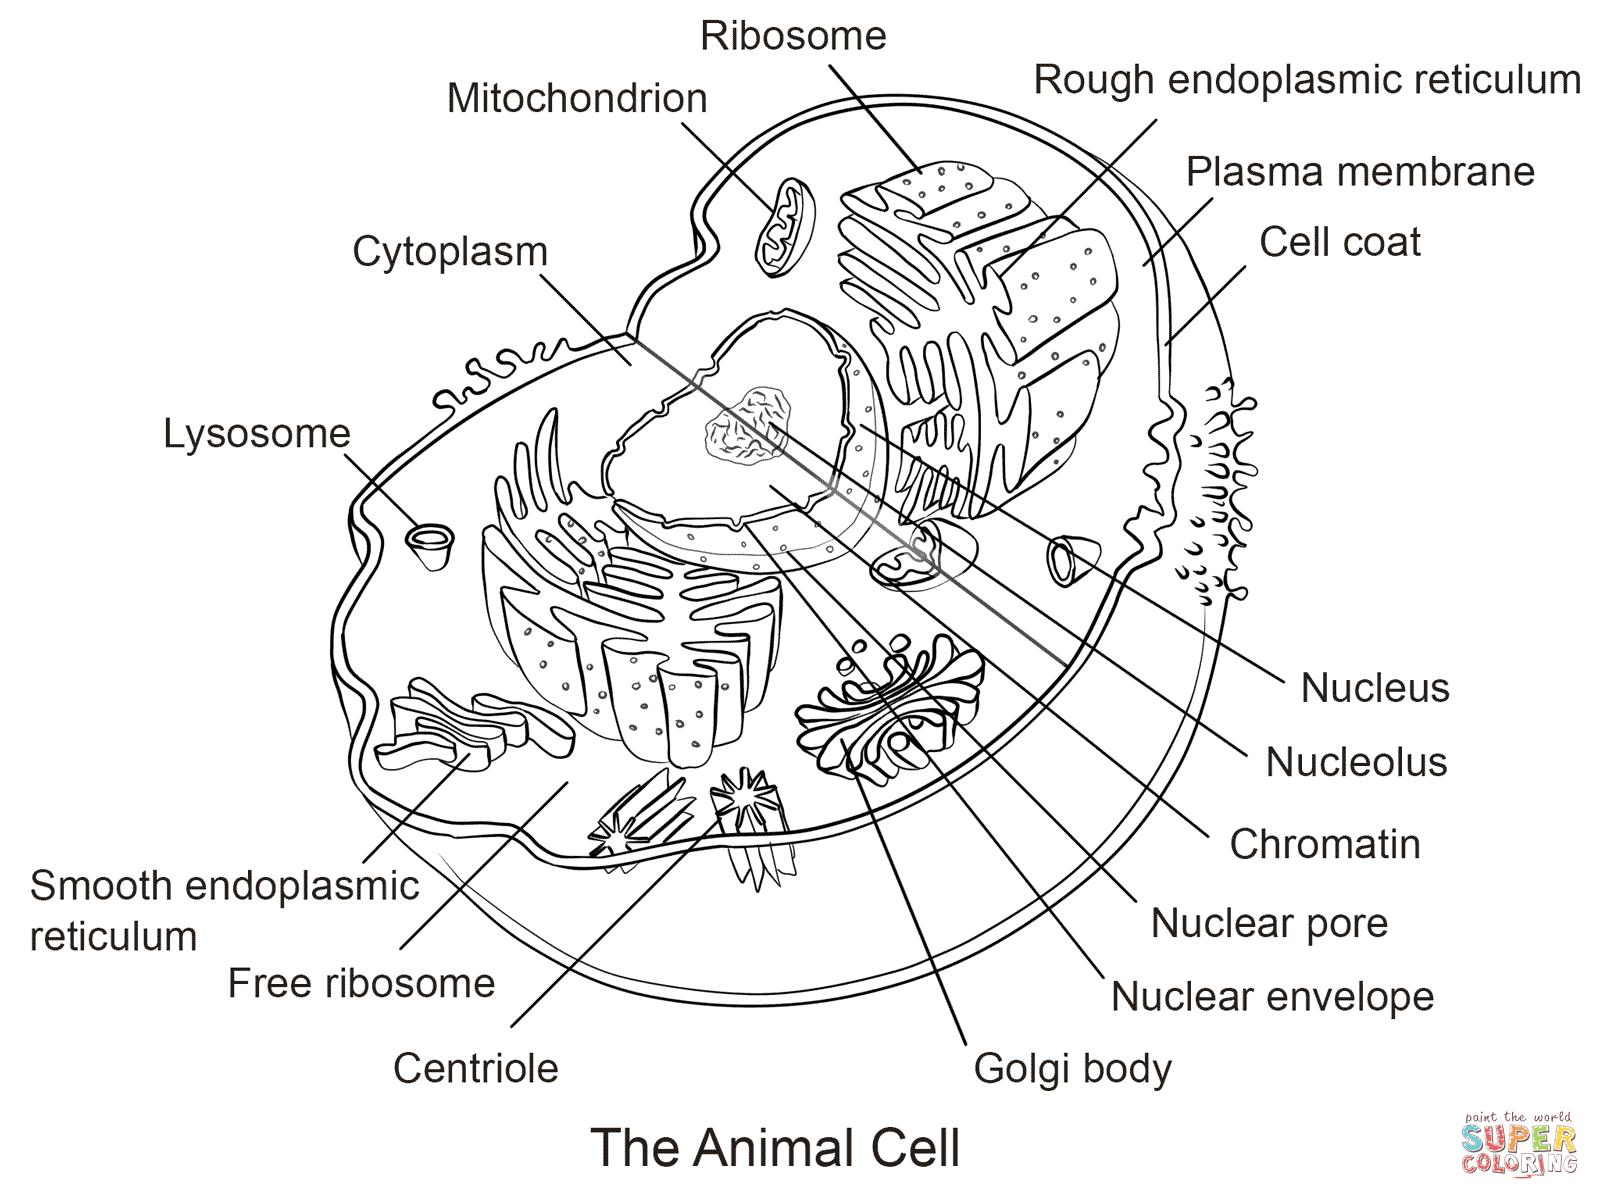 worksheet Animal And Plant Cells Worksheet pictures animal cell worksheet pigmu worksheets for school pigmu